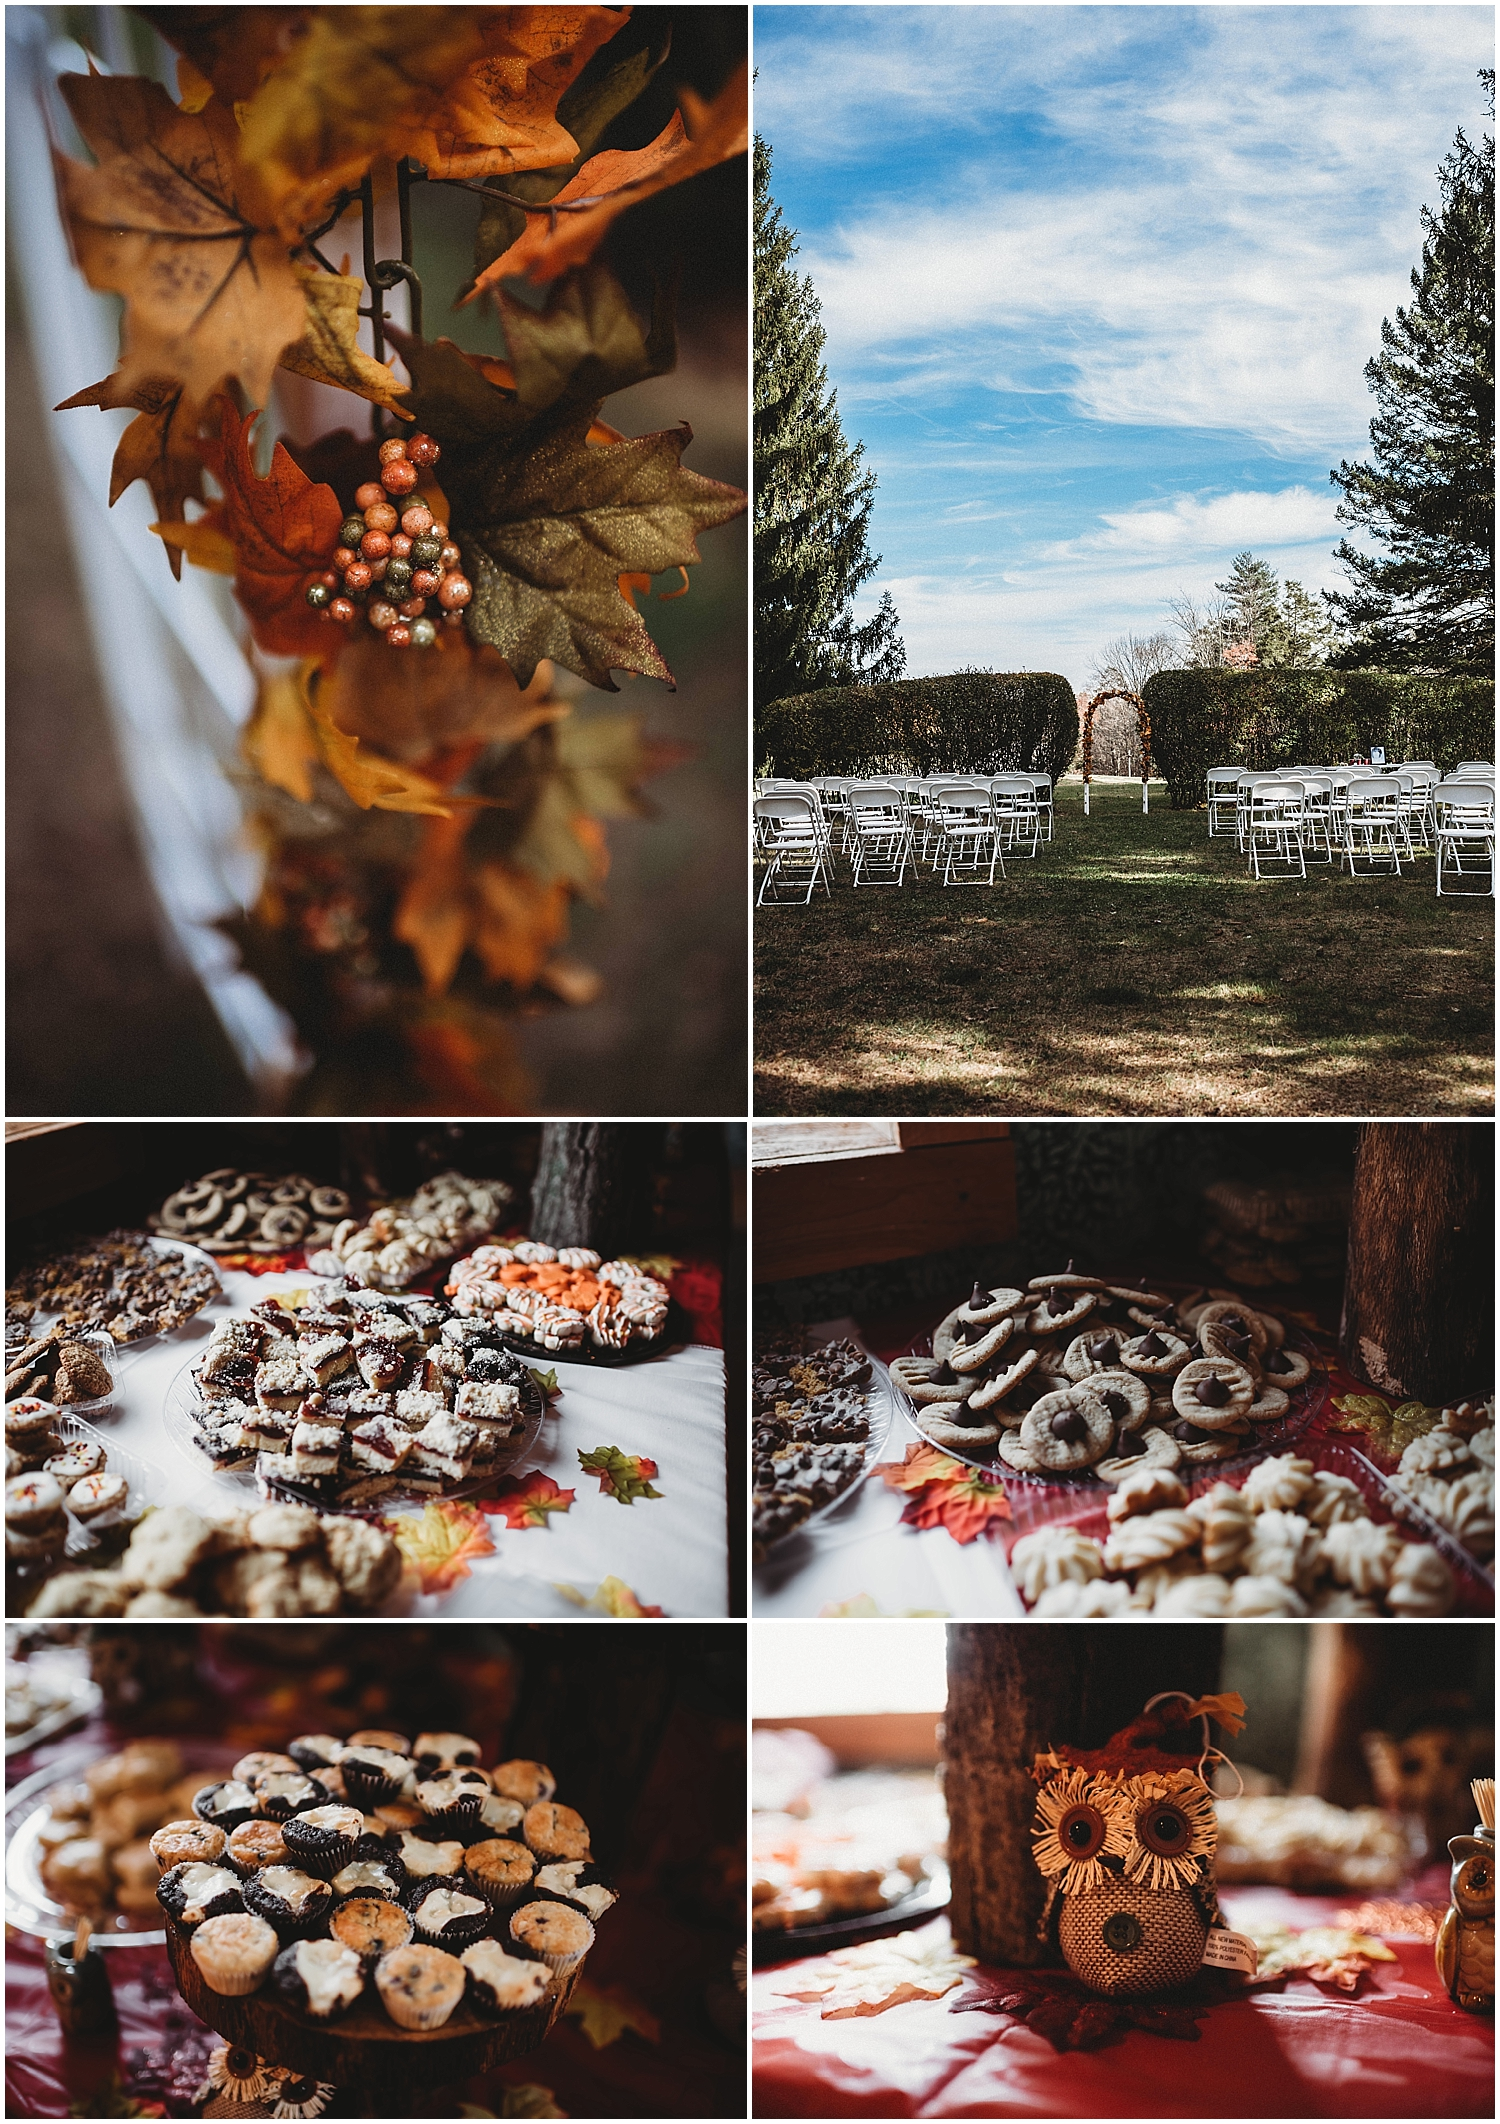 NEPA-Scranton-Sandals-Southcoast-wedding-engagement-photographer-in-Philadelphia-PA-Central-PA_0077.jpg